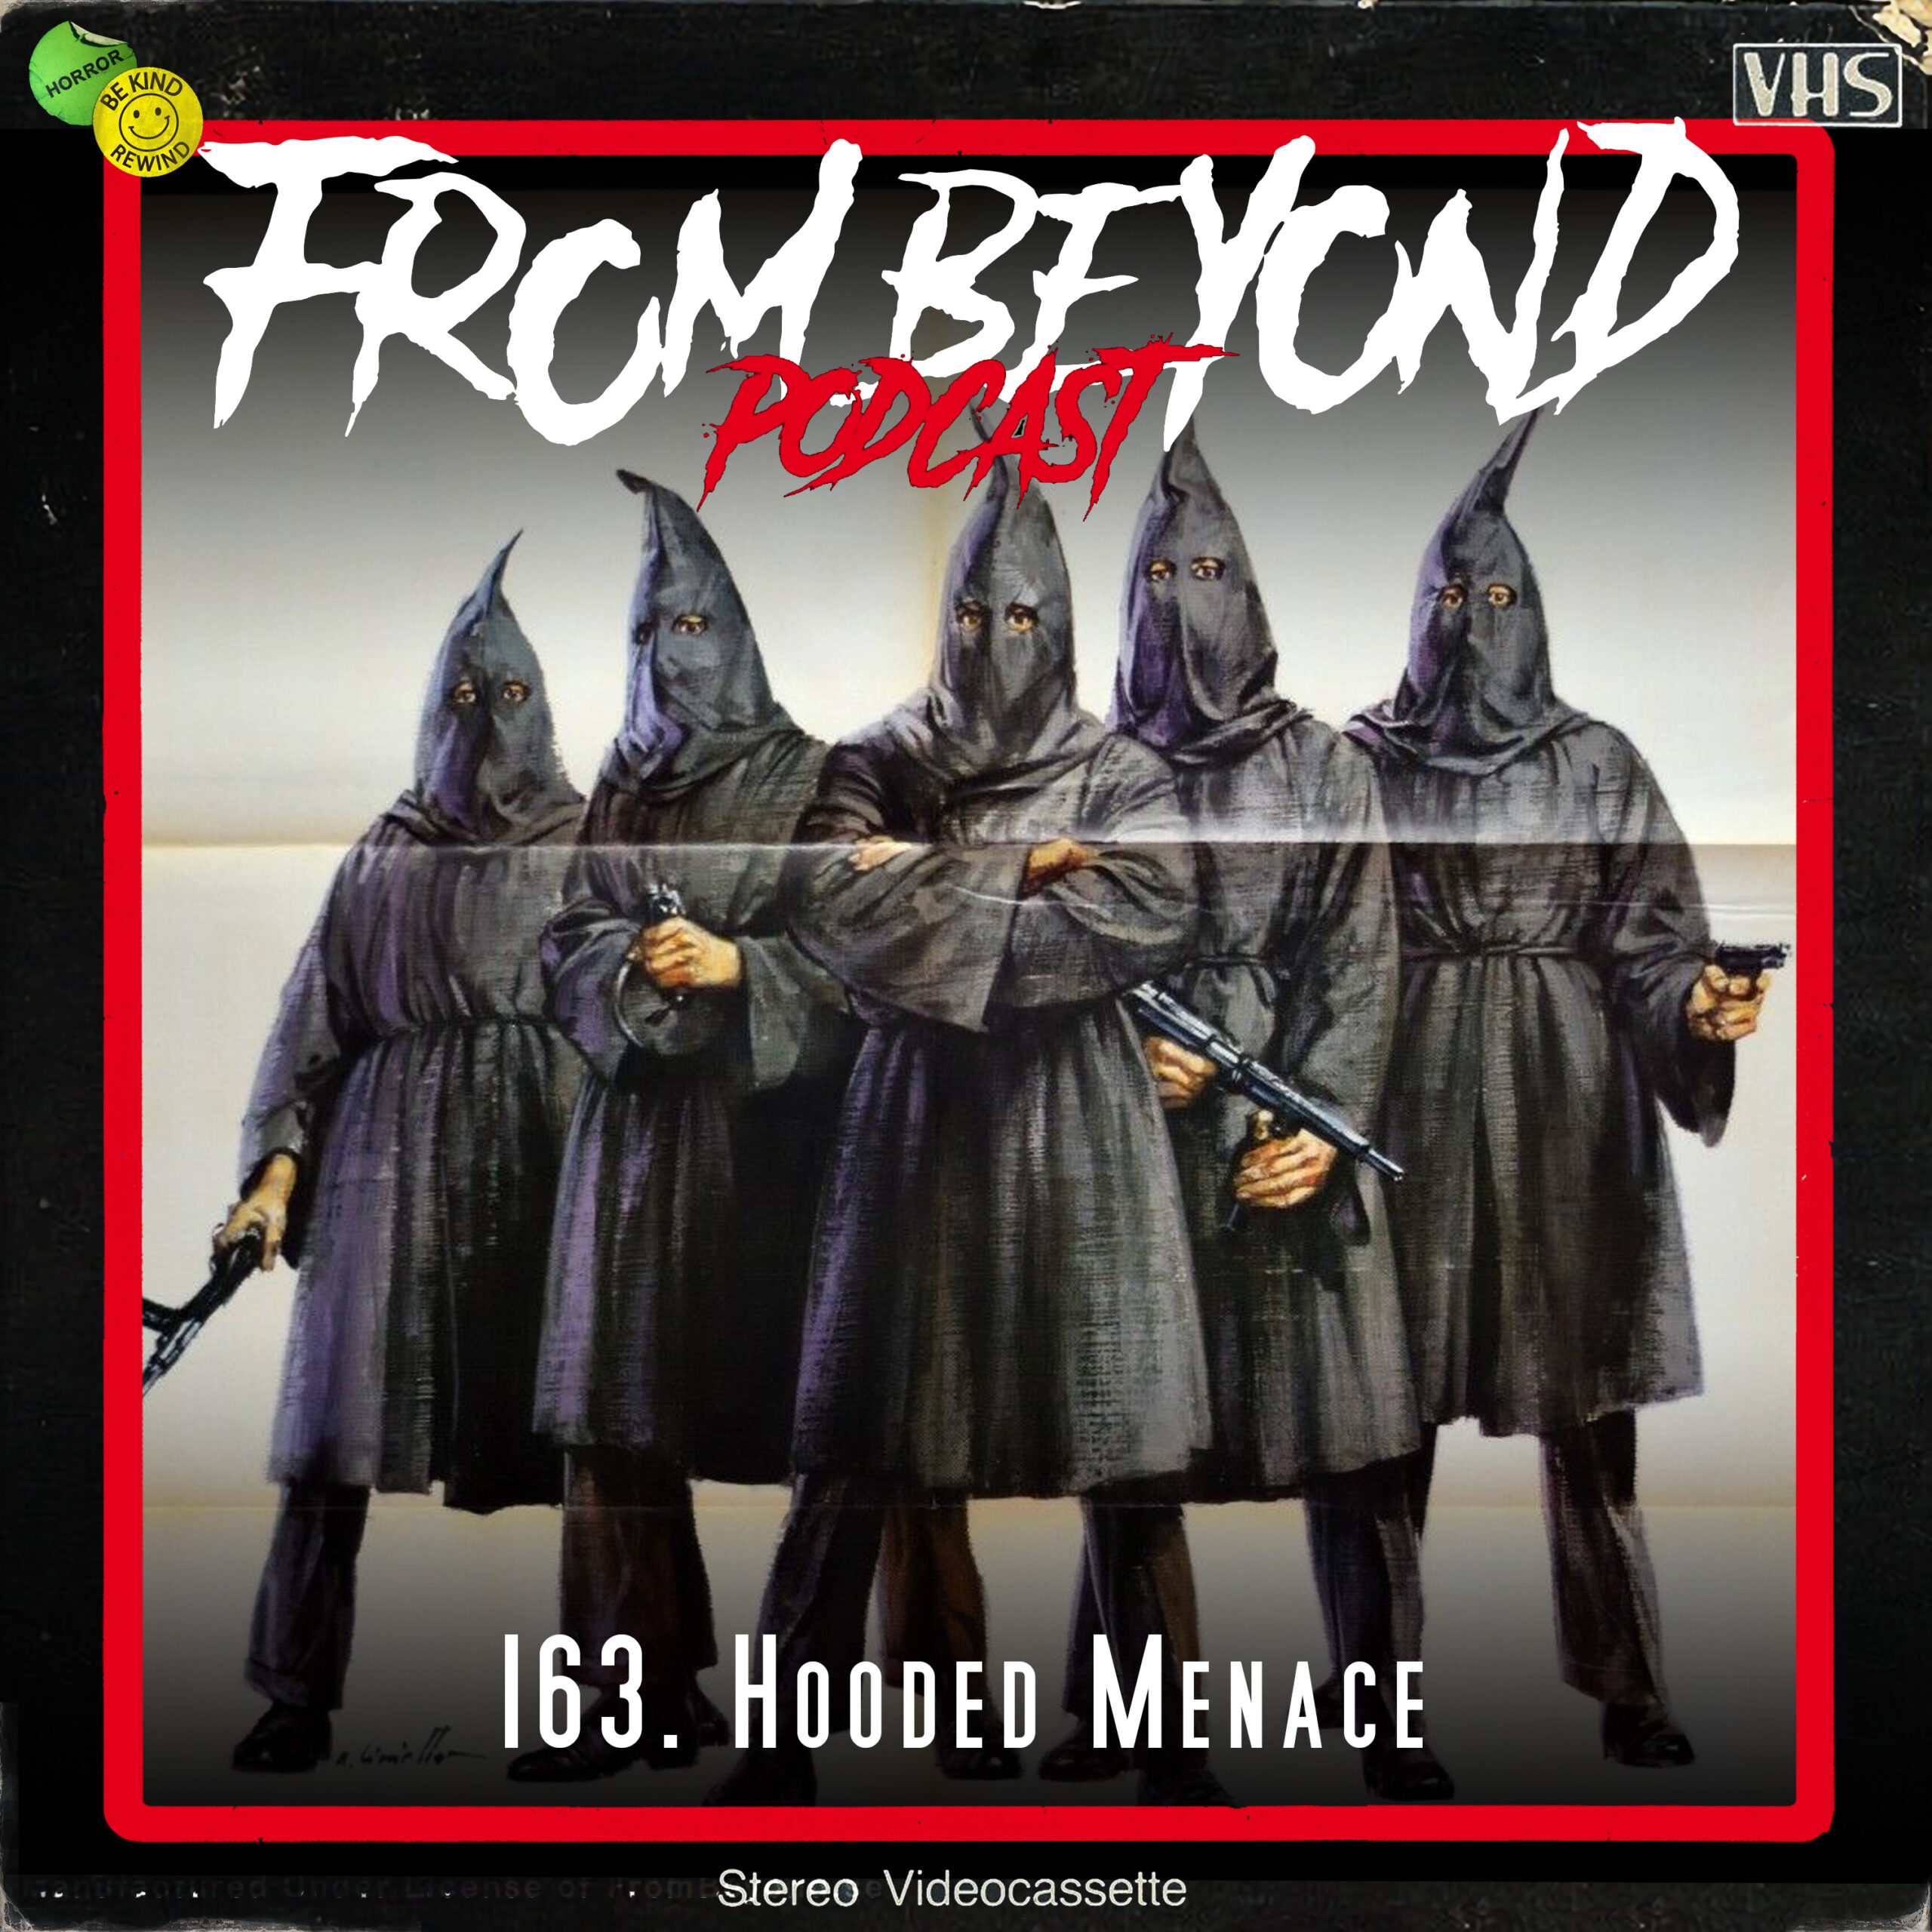 #163 – Hooded Menace